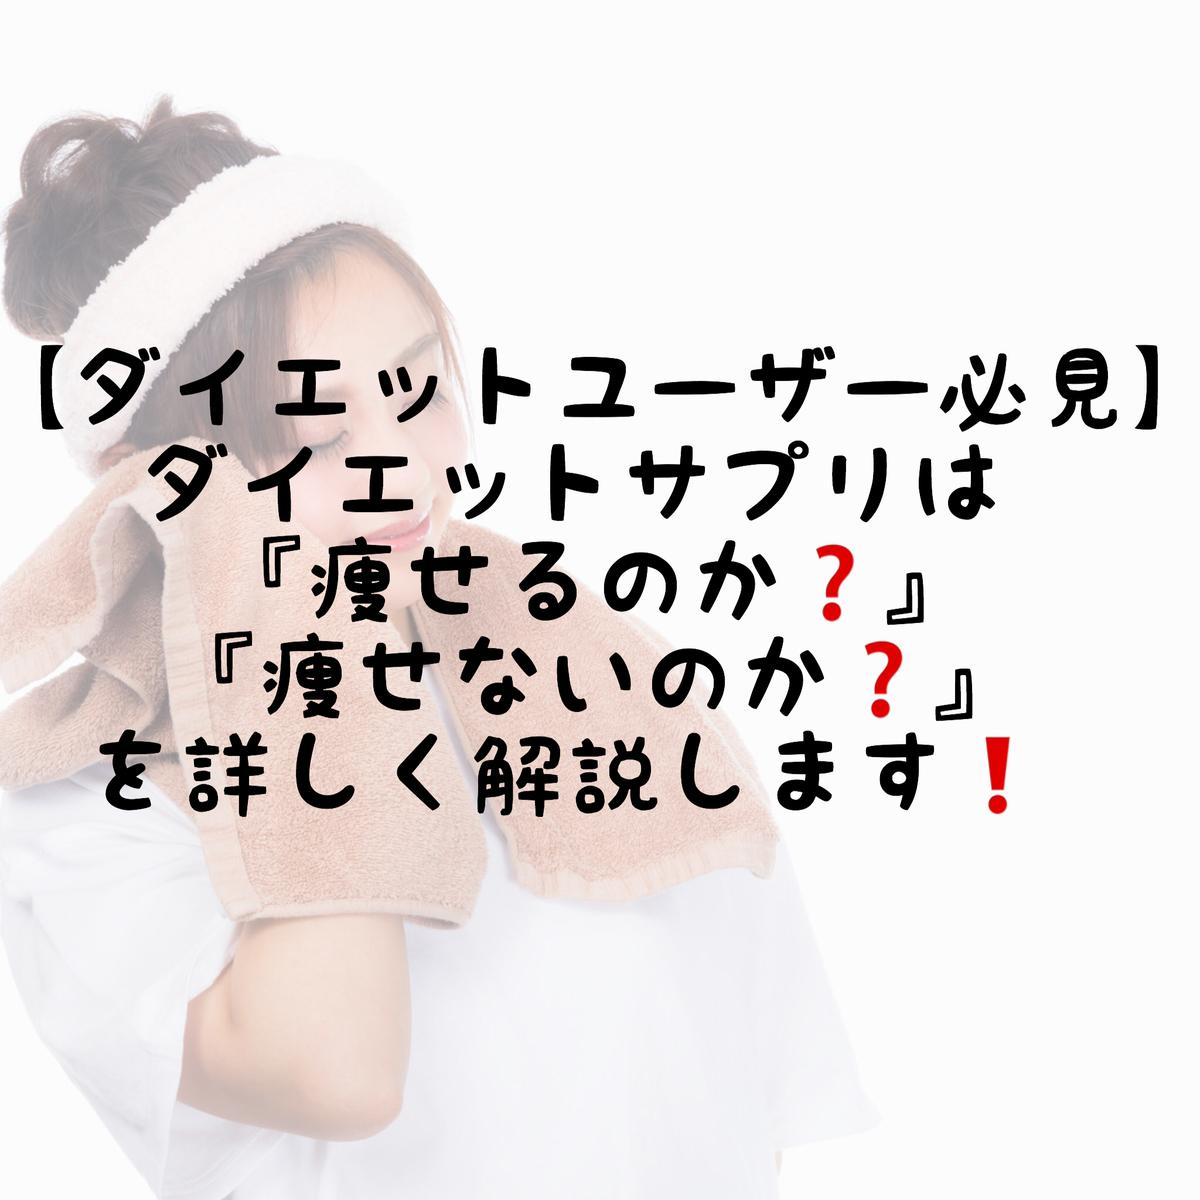 f:id:nokonoko_o:20200529195515j:plain